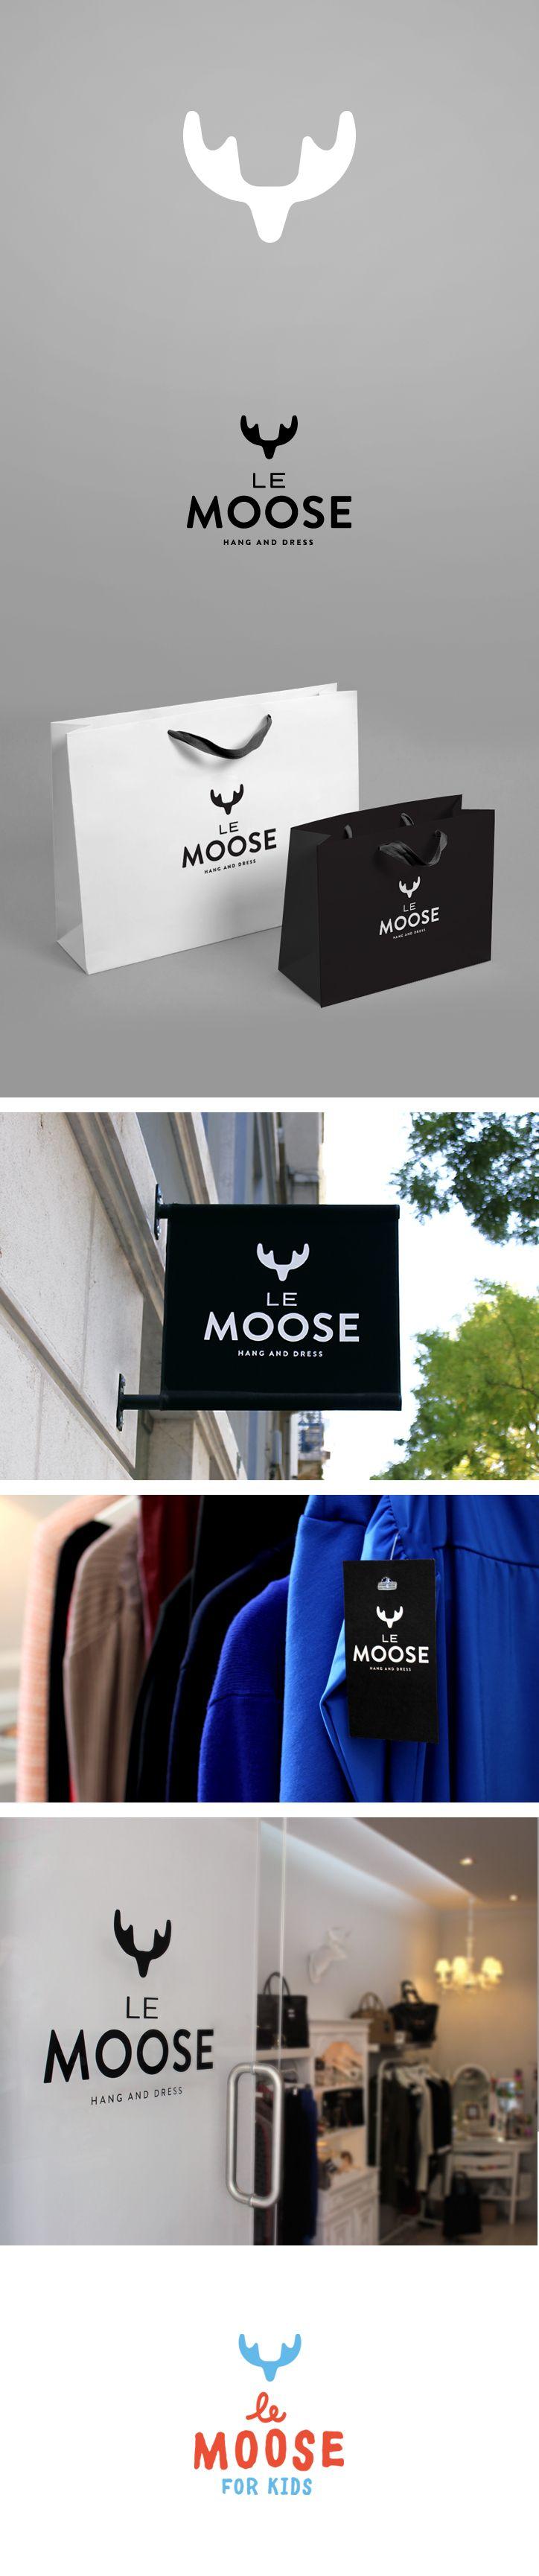 Le Moose Identity - Design by Alexandre Mendes